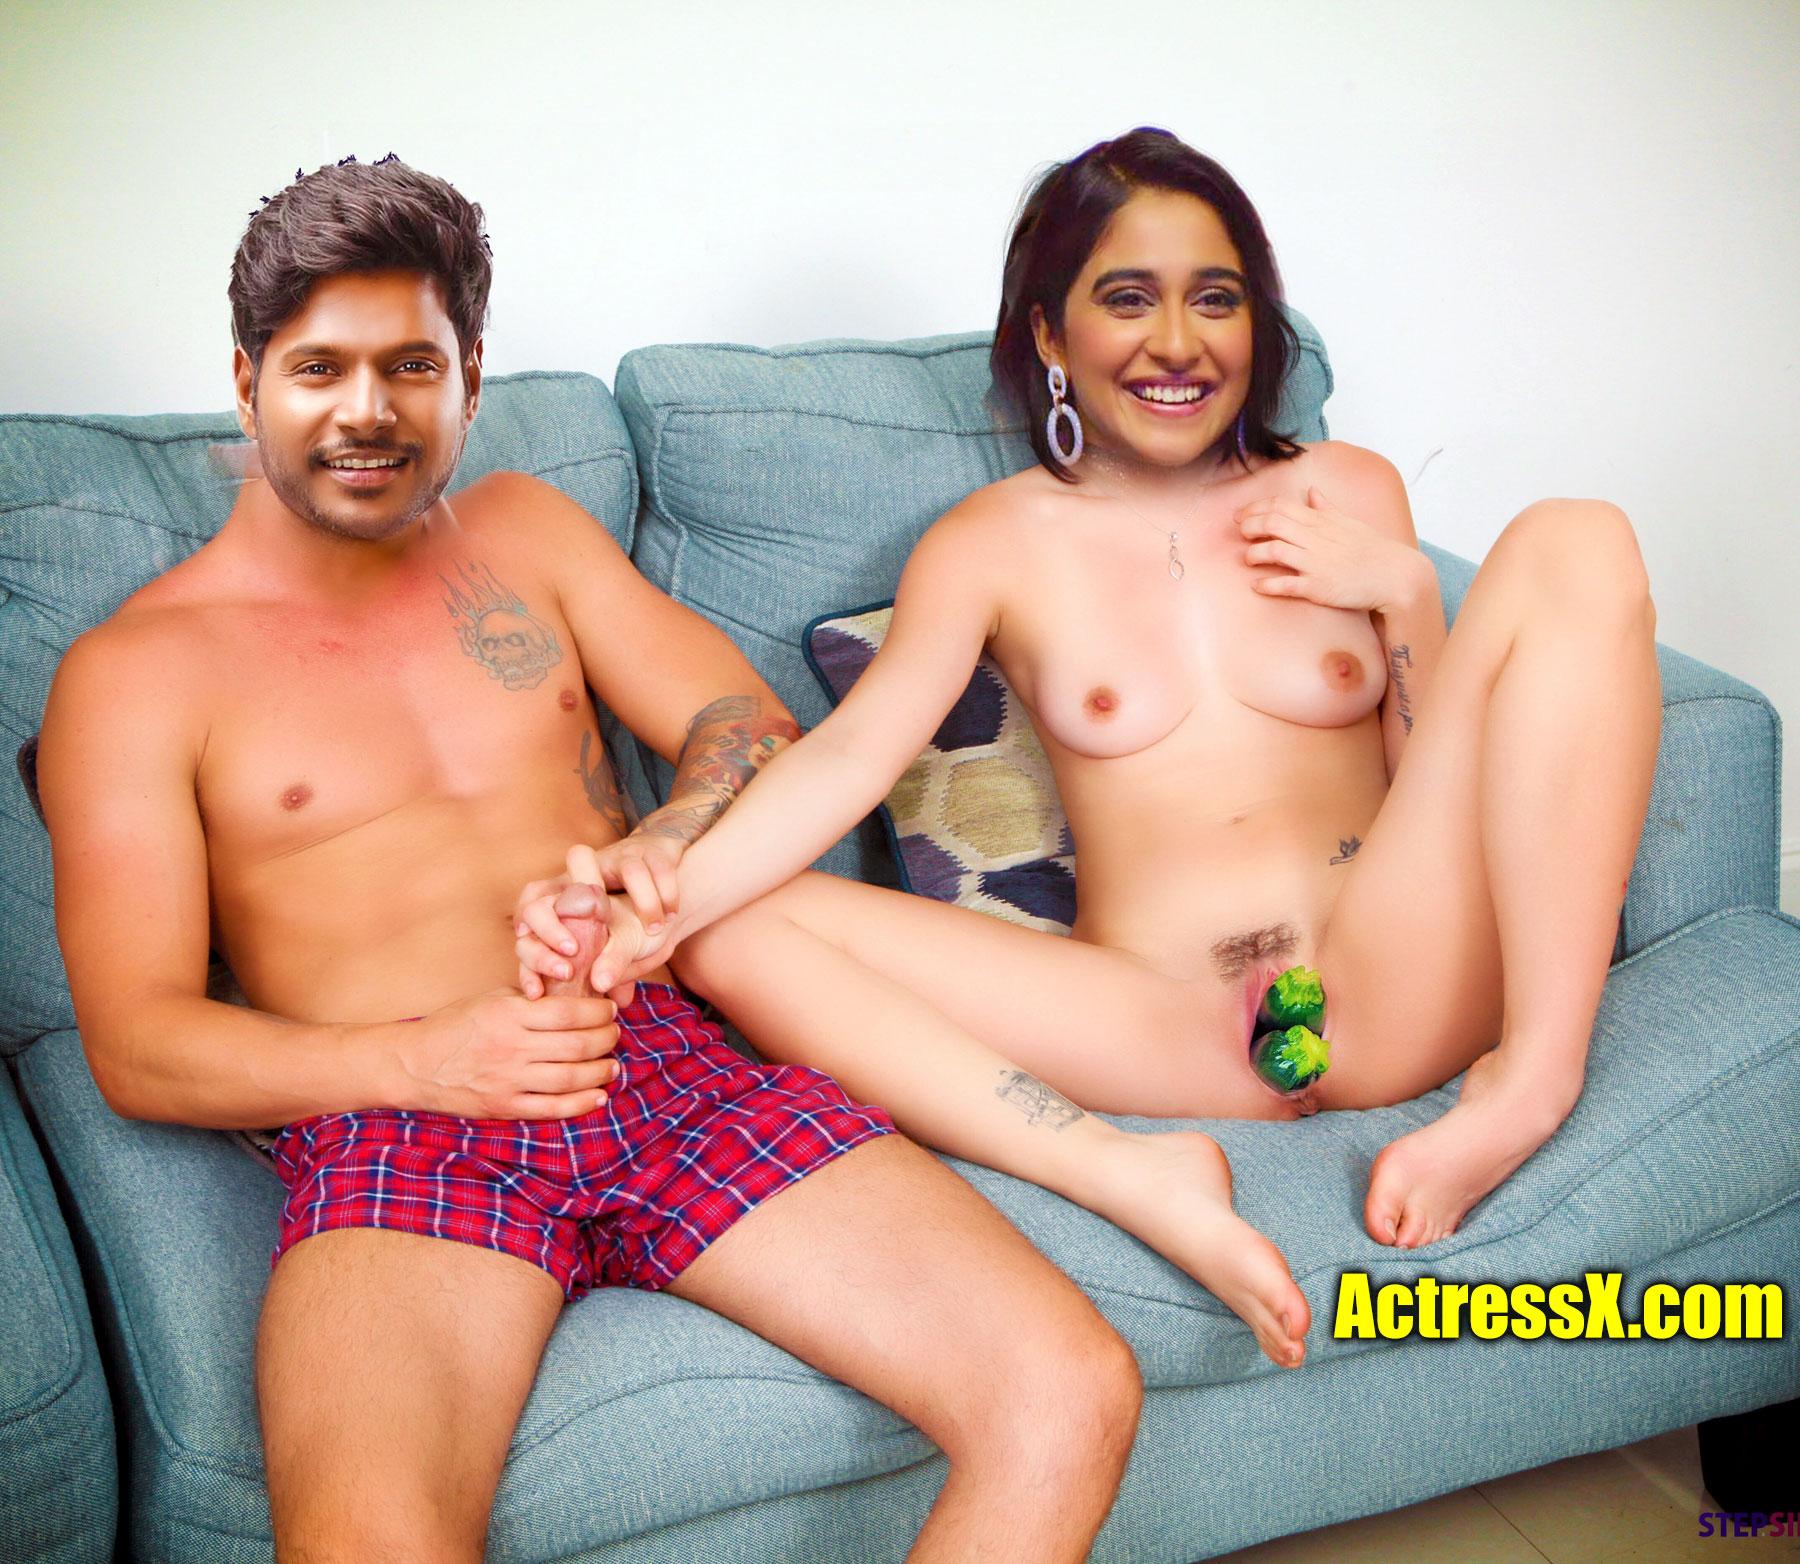 Naked Regina Cassandra handjob Sundeep cock cucumber inside nude pussy